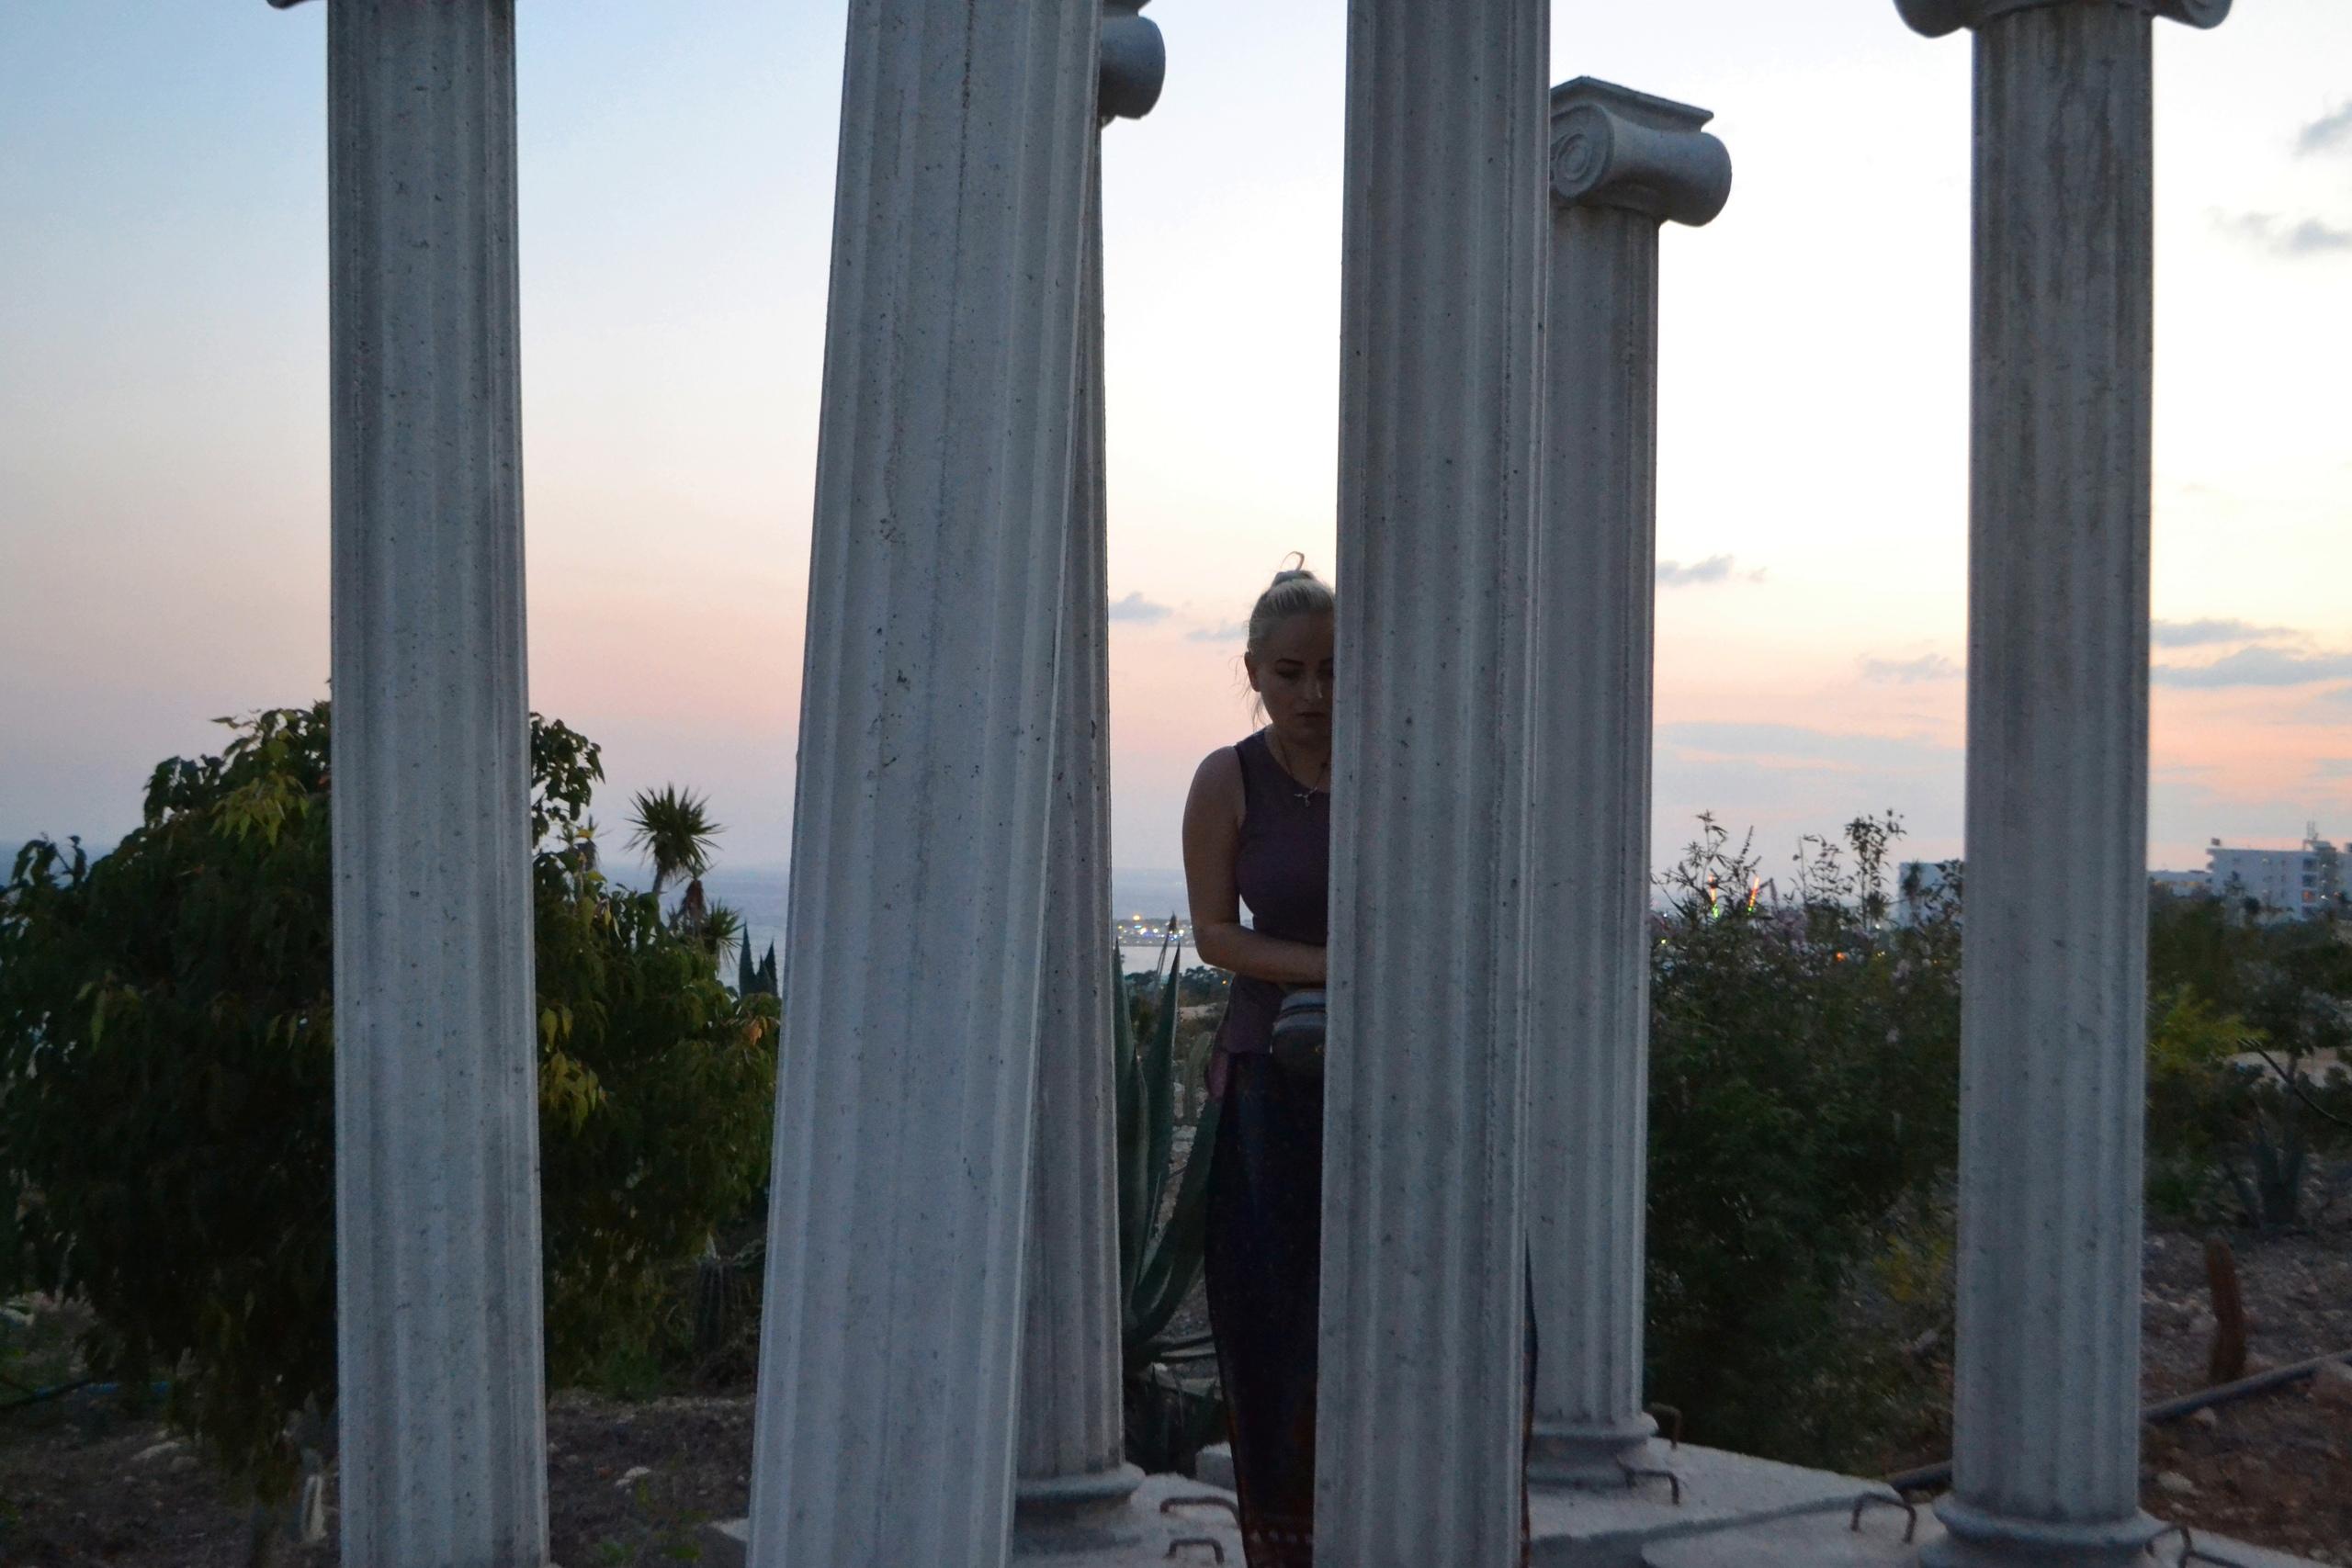 Елена Руденко (Валтея). Кипр. Парк скульптур (фото). - Страница 2 CdYr2VCqxr4